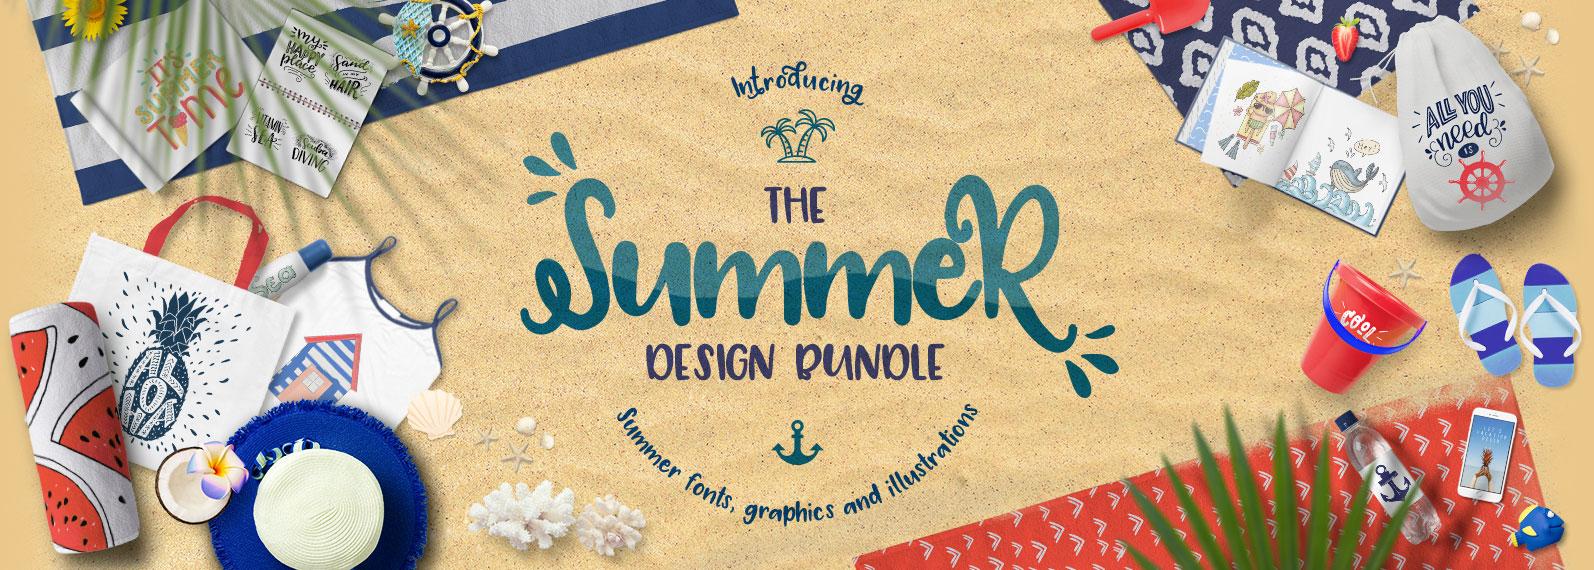 The Summer Design Bundle Cover